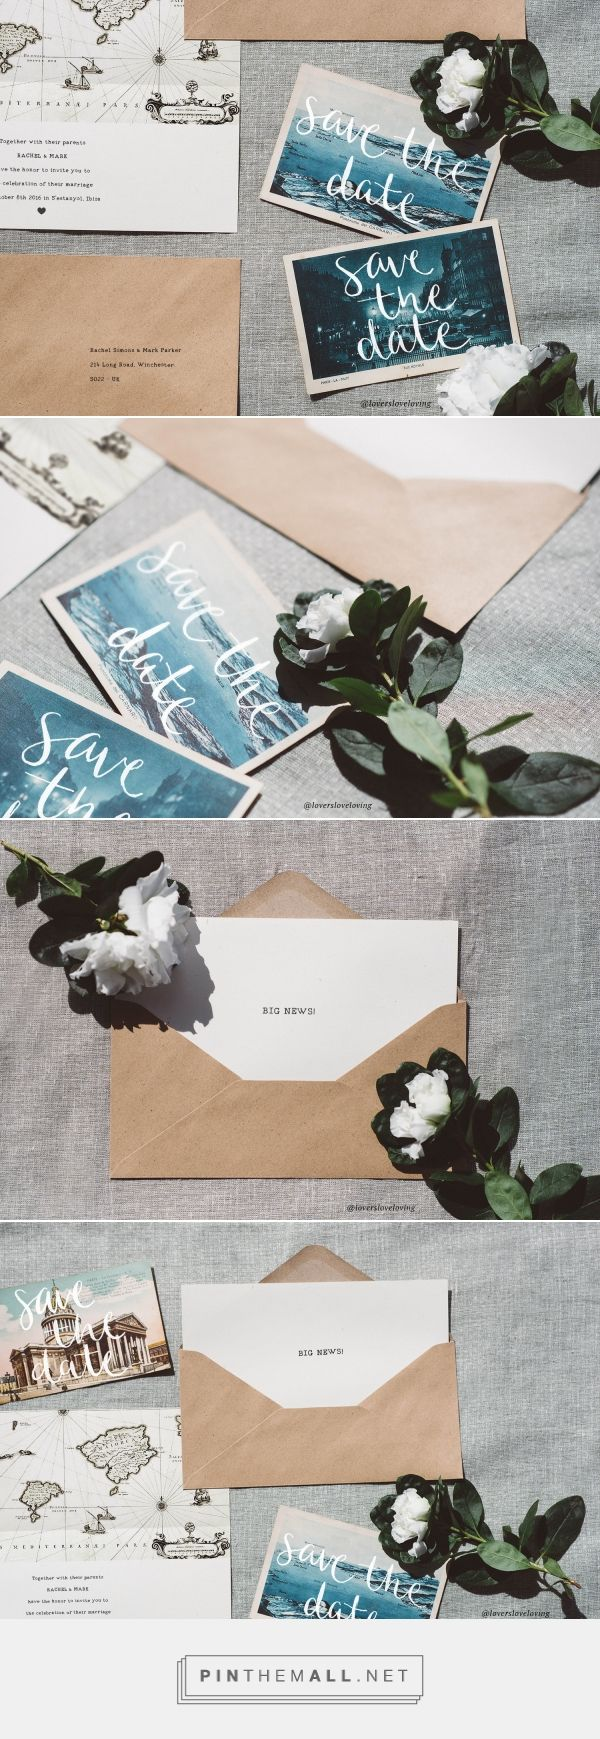 Destination vintage wedding for travel lovers - map wedding invitations design » Lovers Love Loving